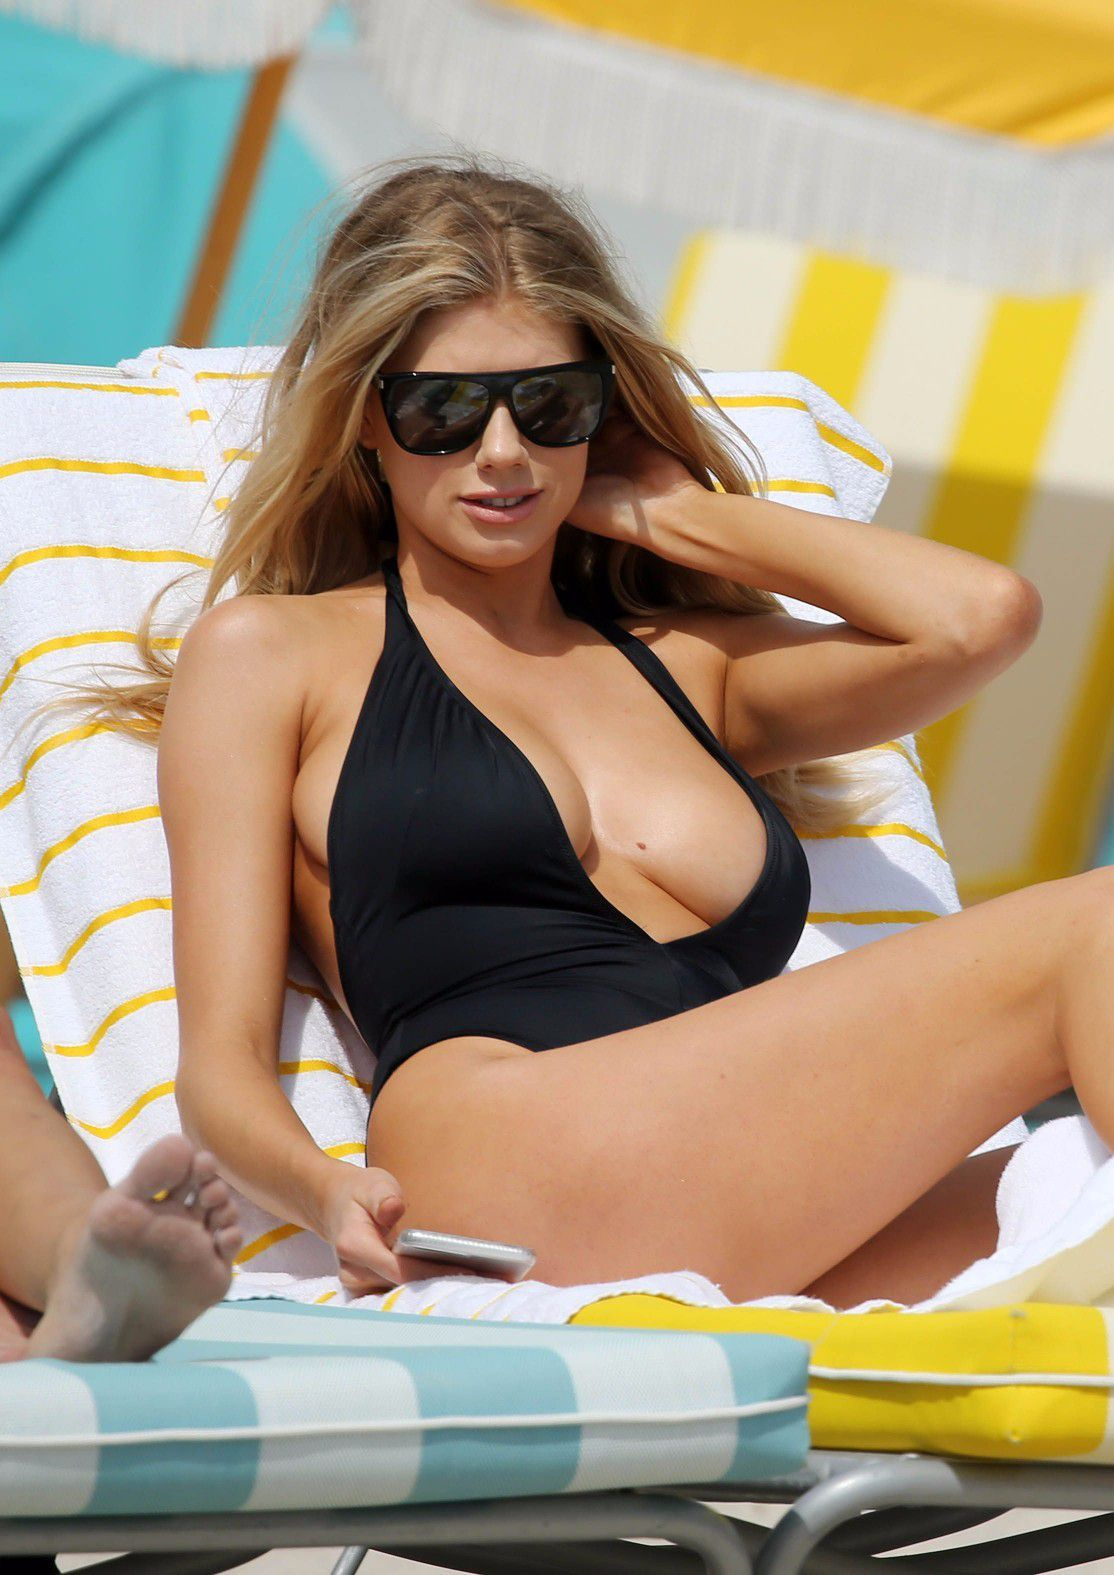 Charlotte mckinney nipple slip - 2019 year